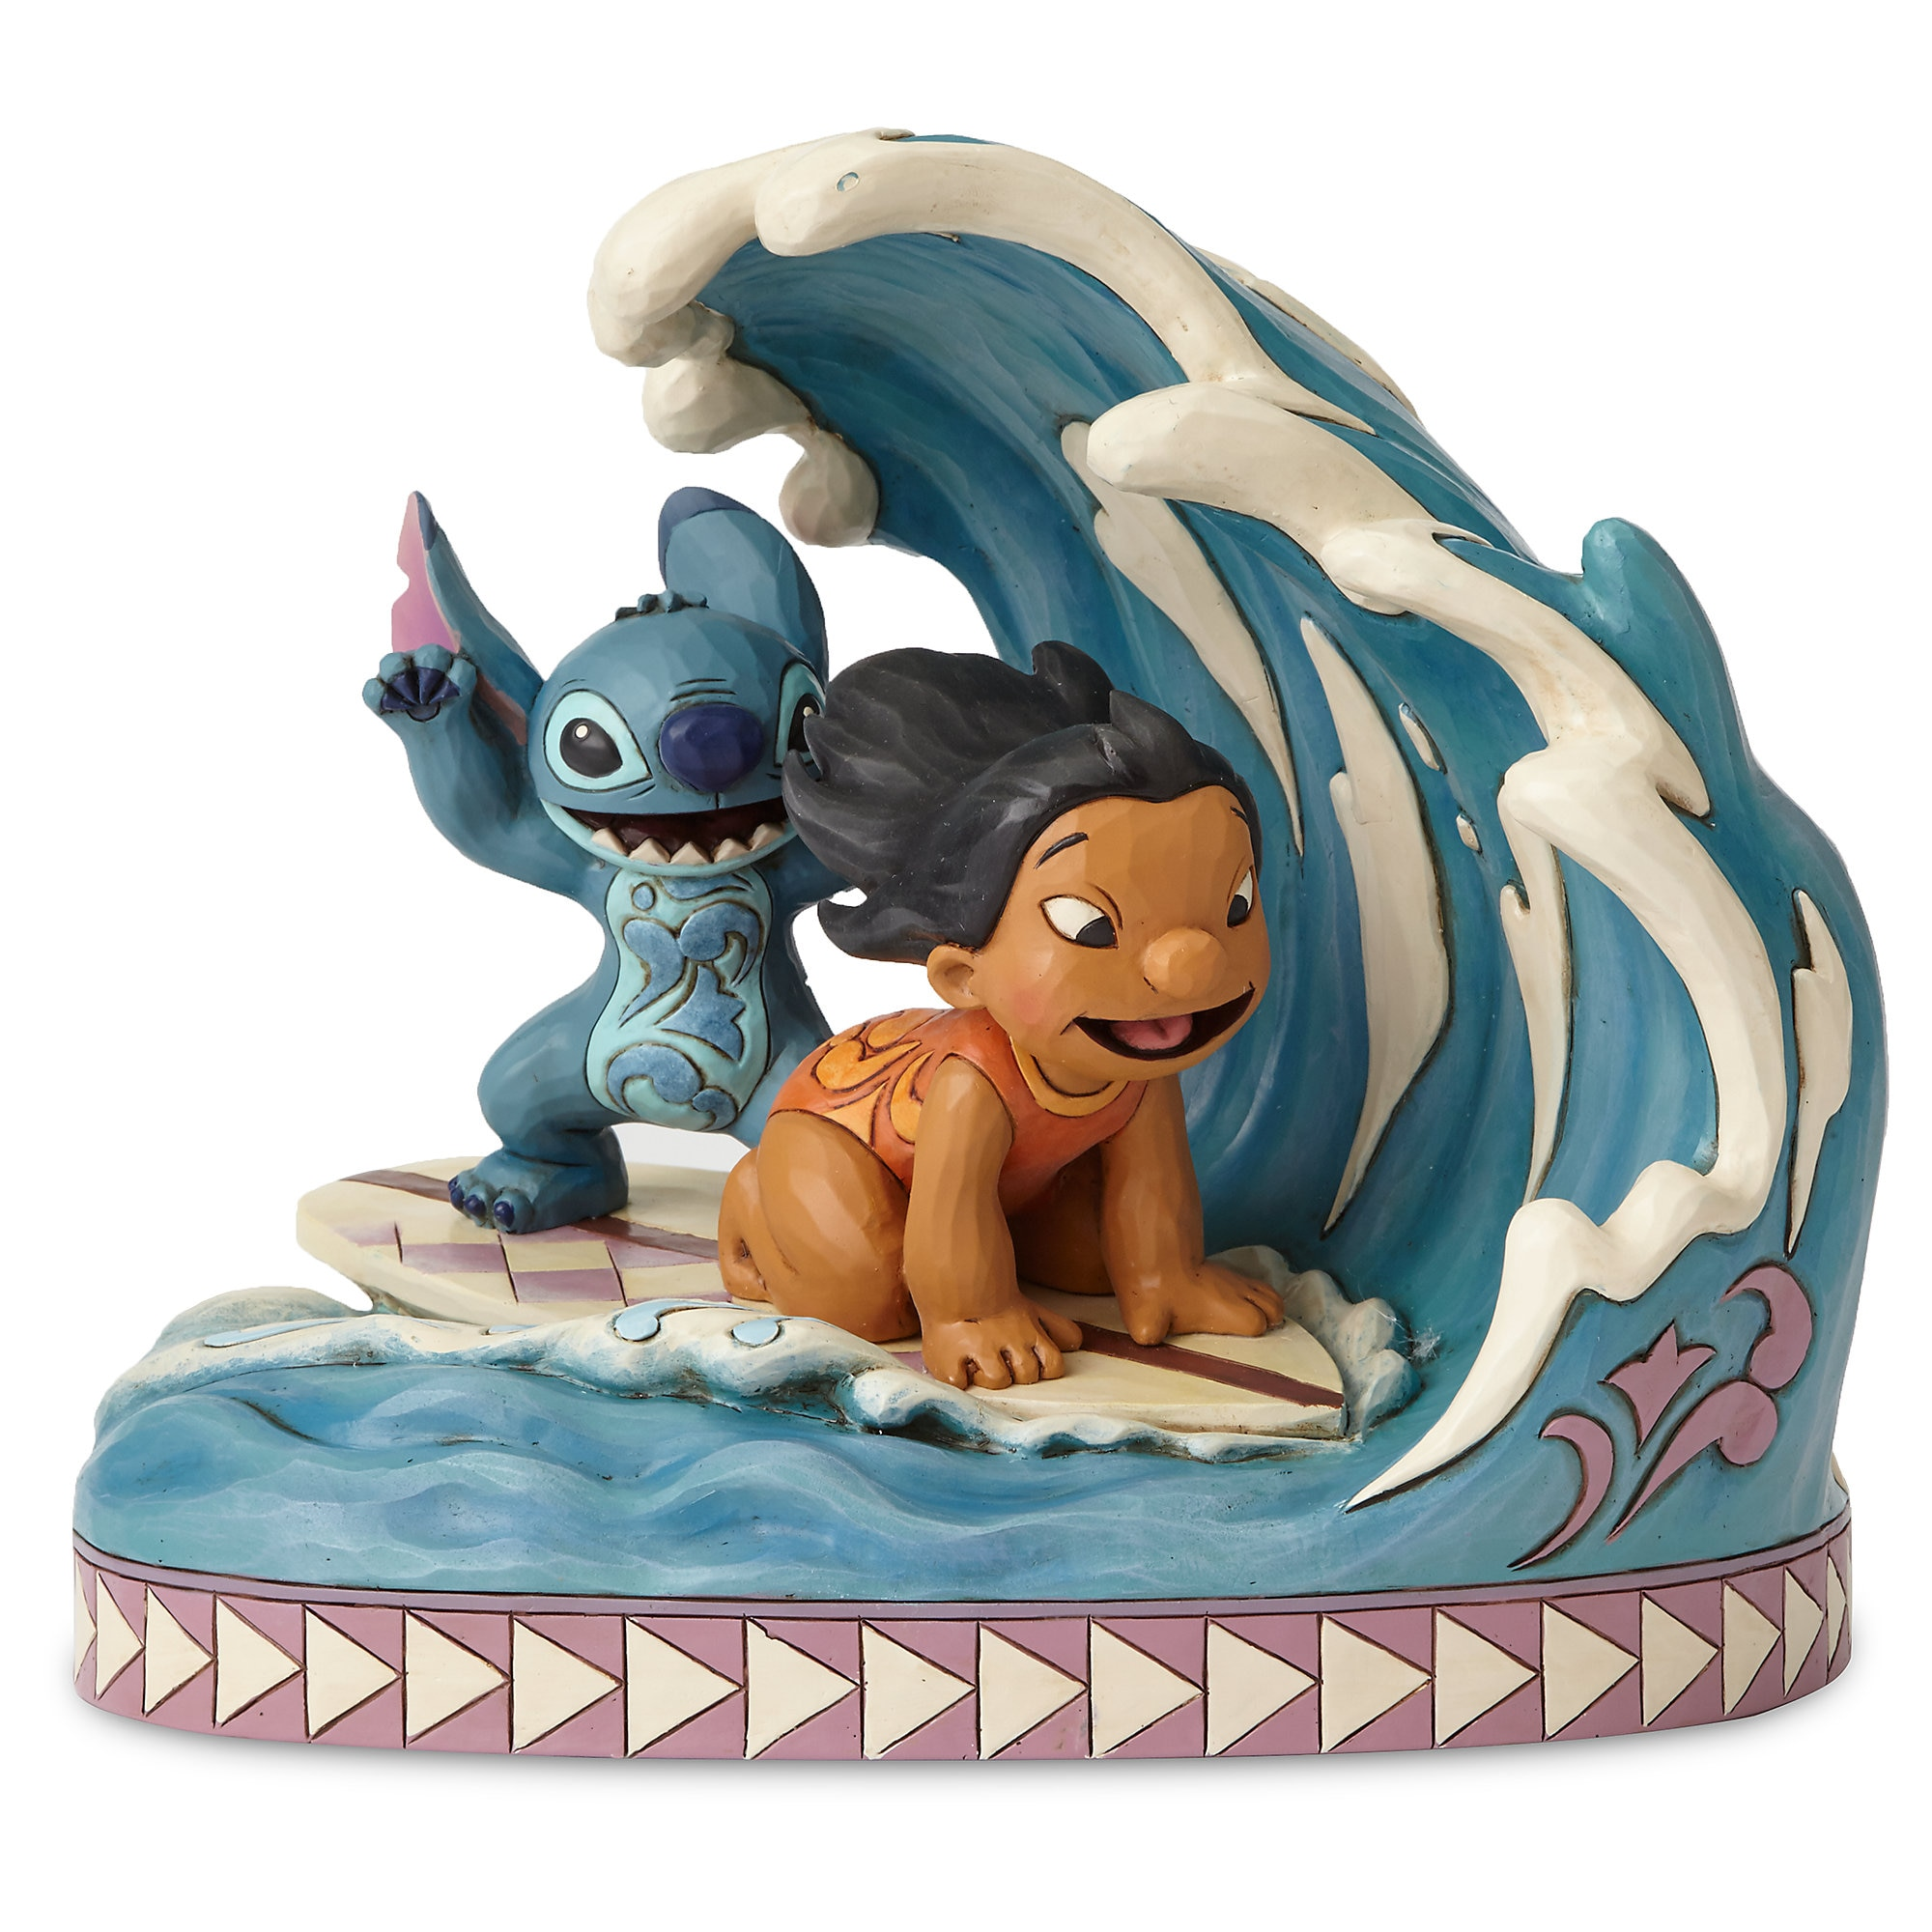 Lilo & Stitch ''Catch the Wave'' Figure by Jim Shore